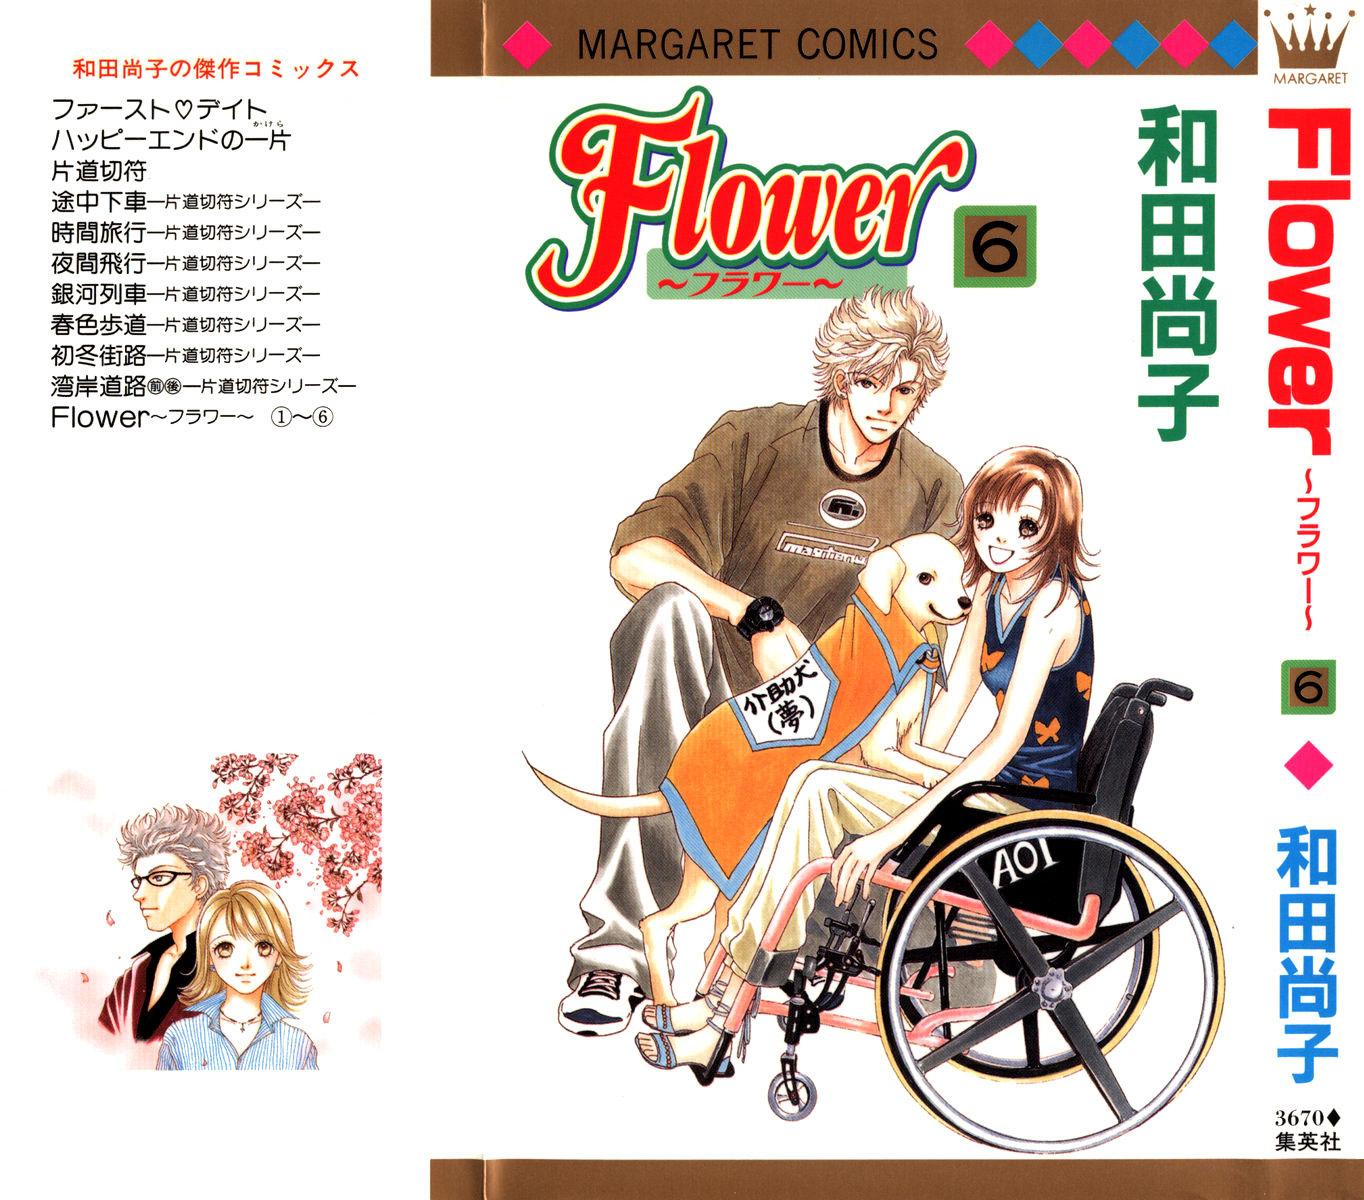 Flower (WADA Naoko) 14 Page 2